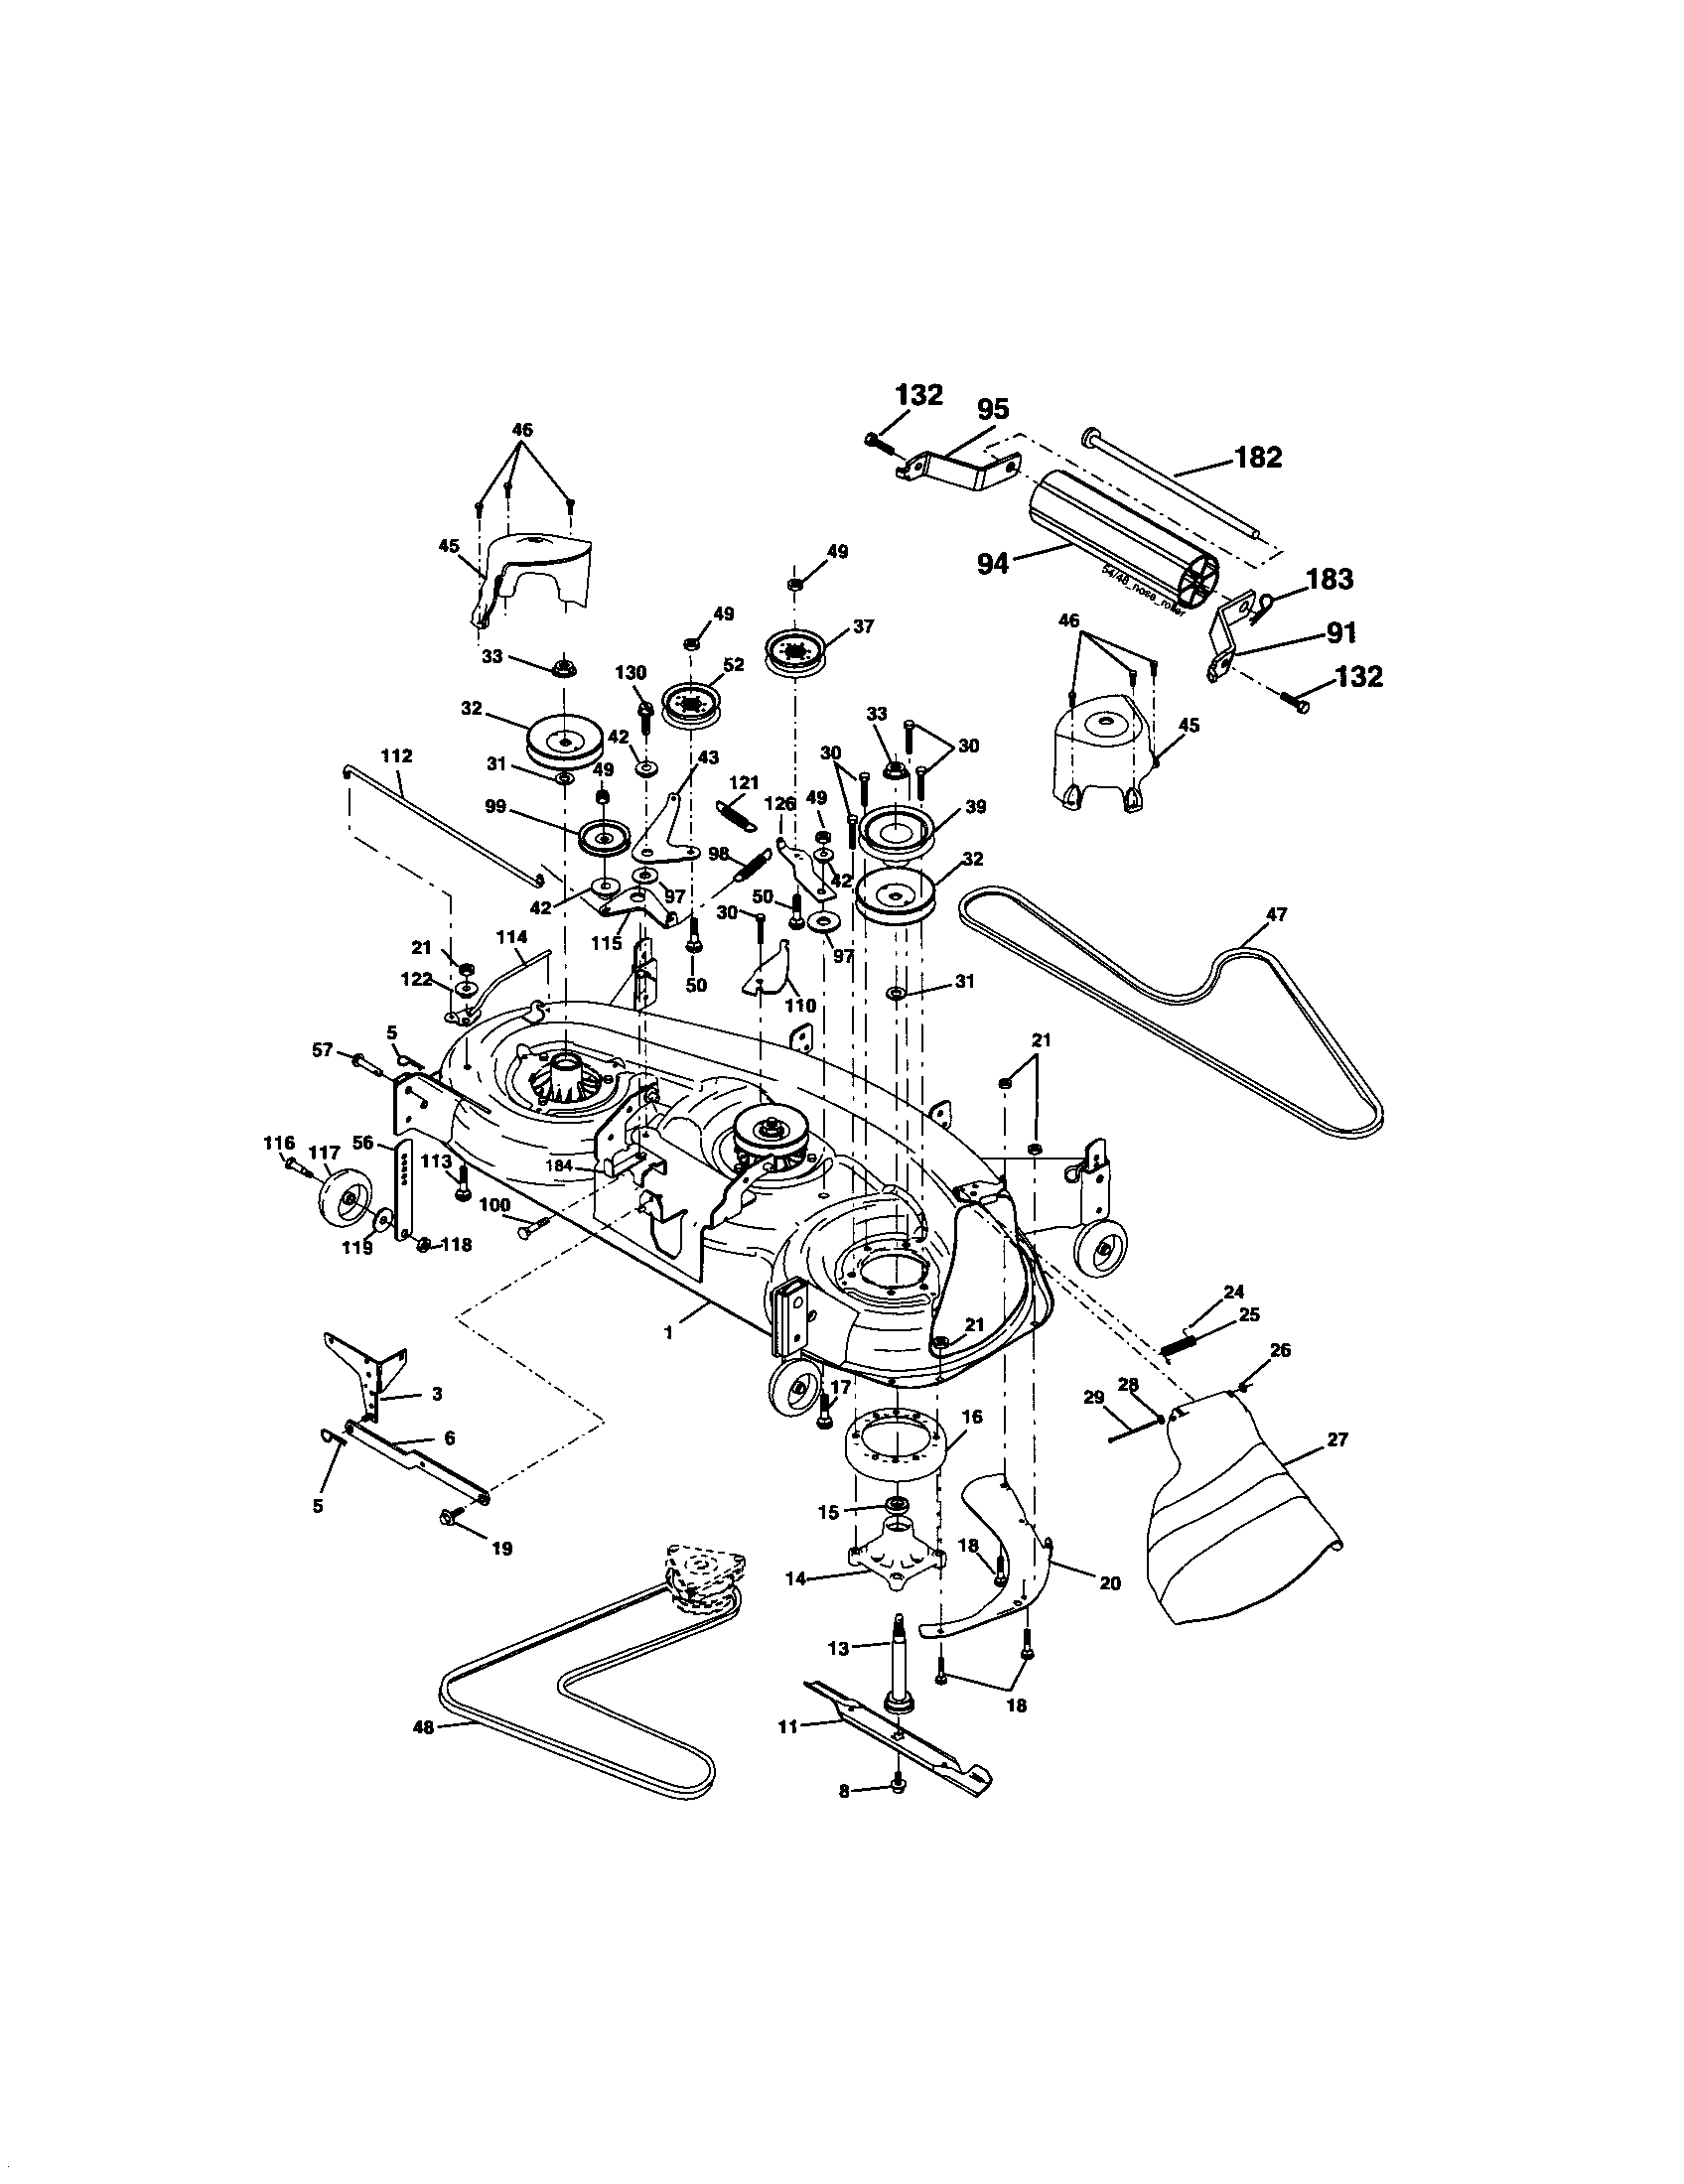 solarmax extreme wiring diagram